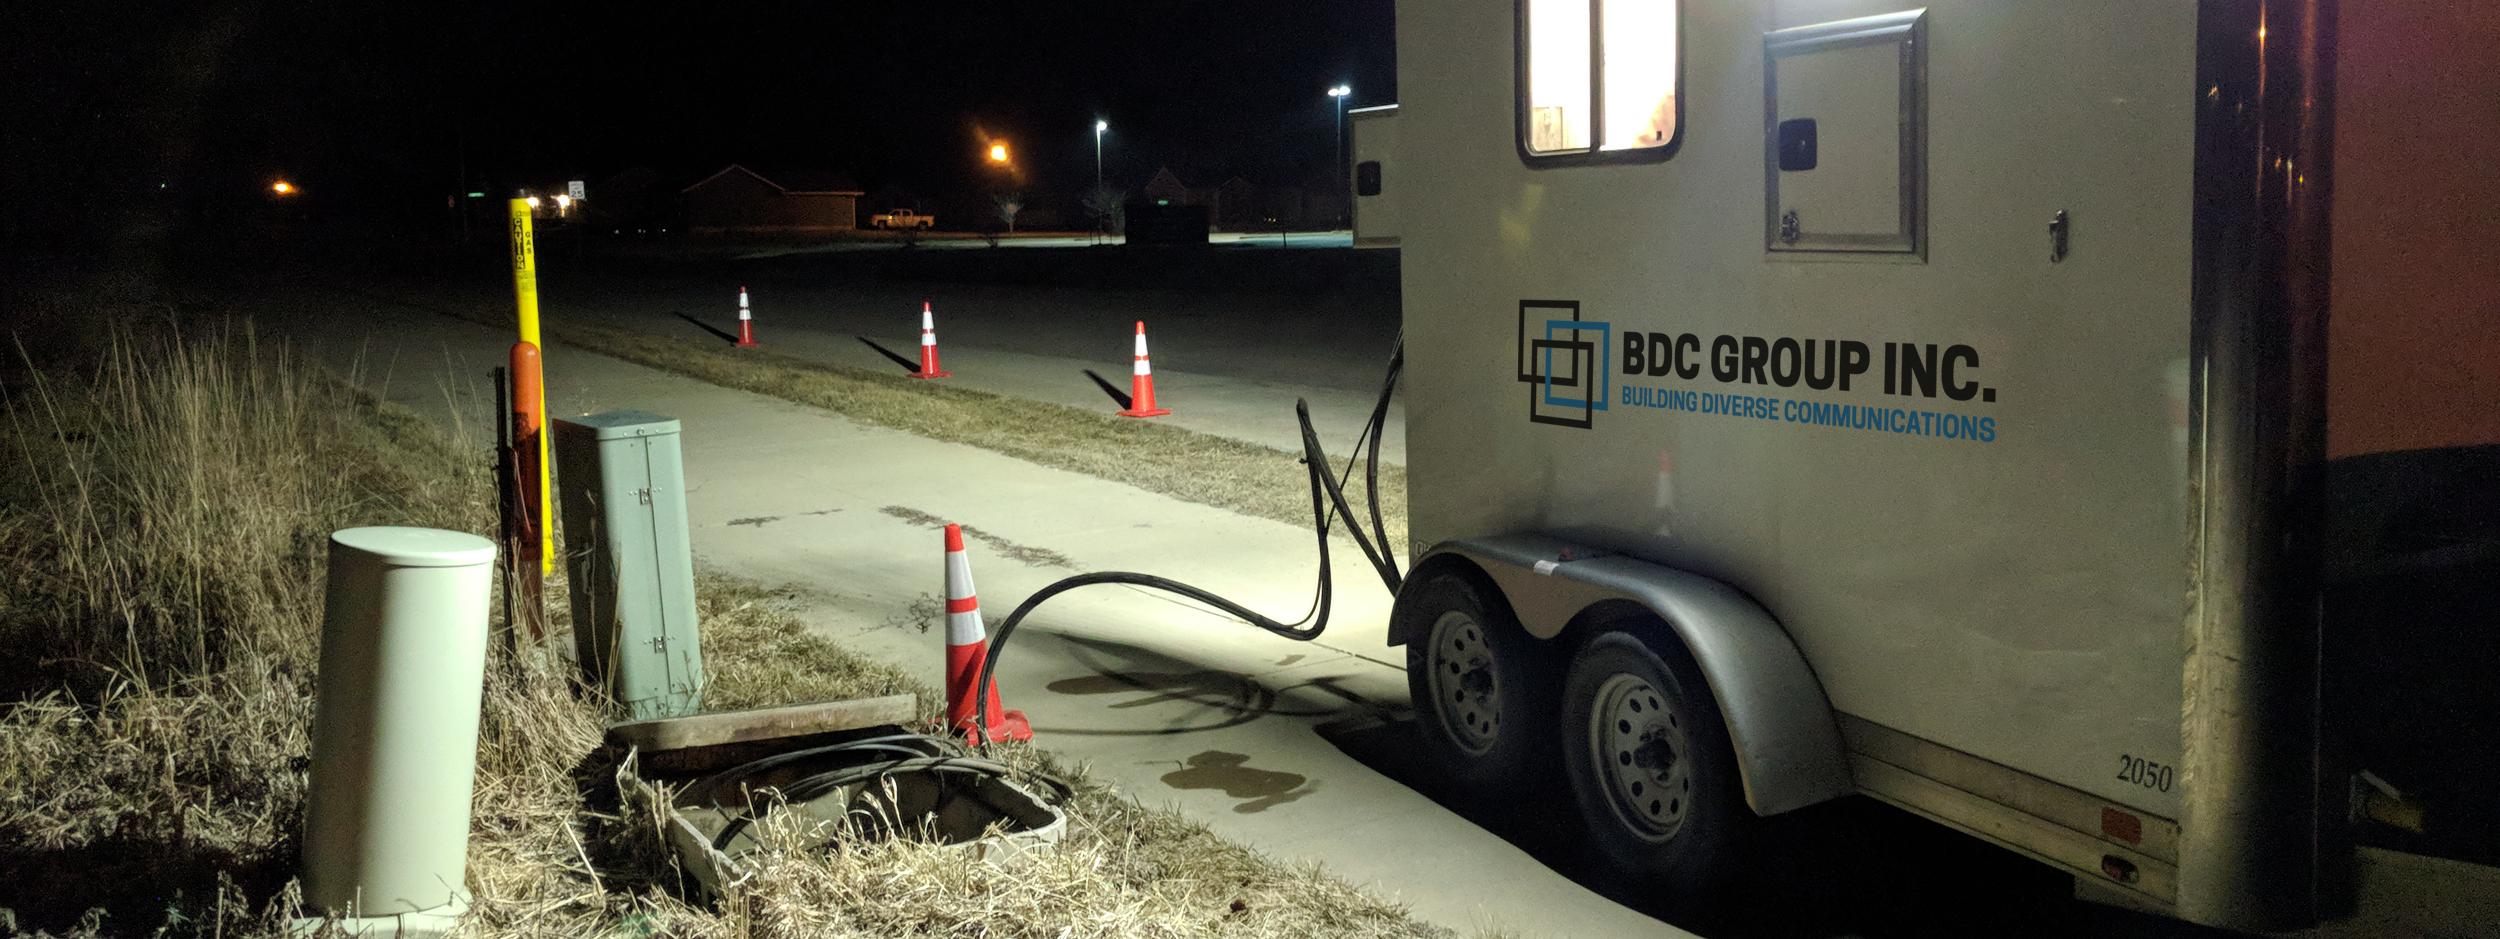 BDC Group Night Fiber Splicing